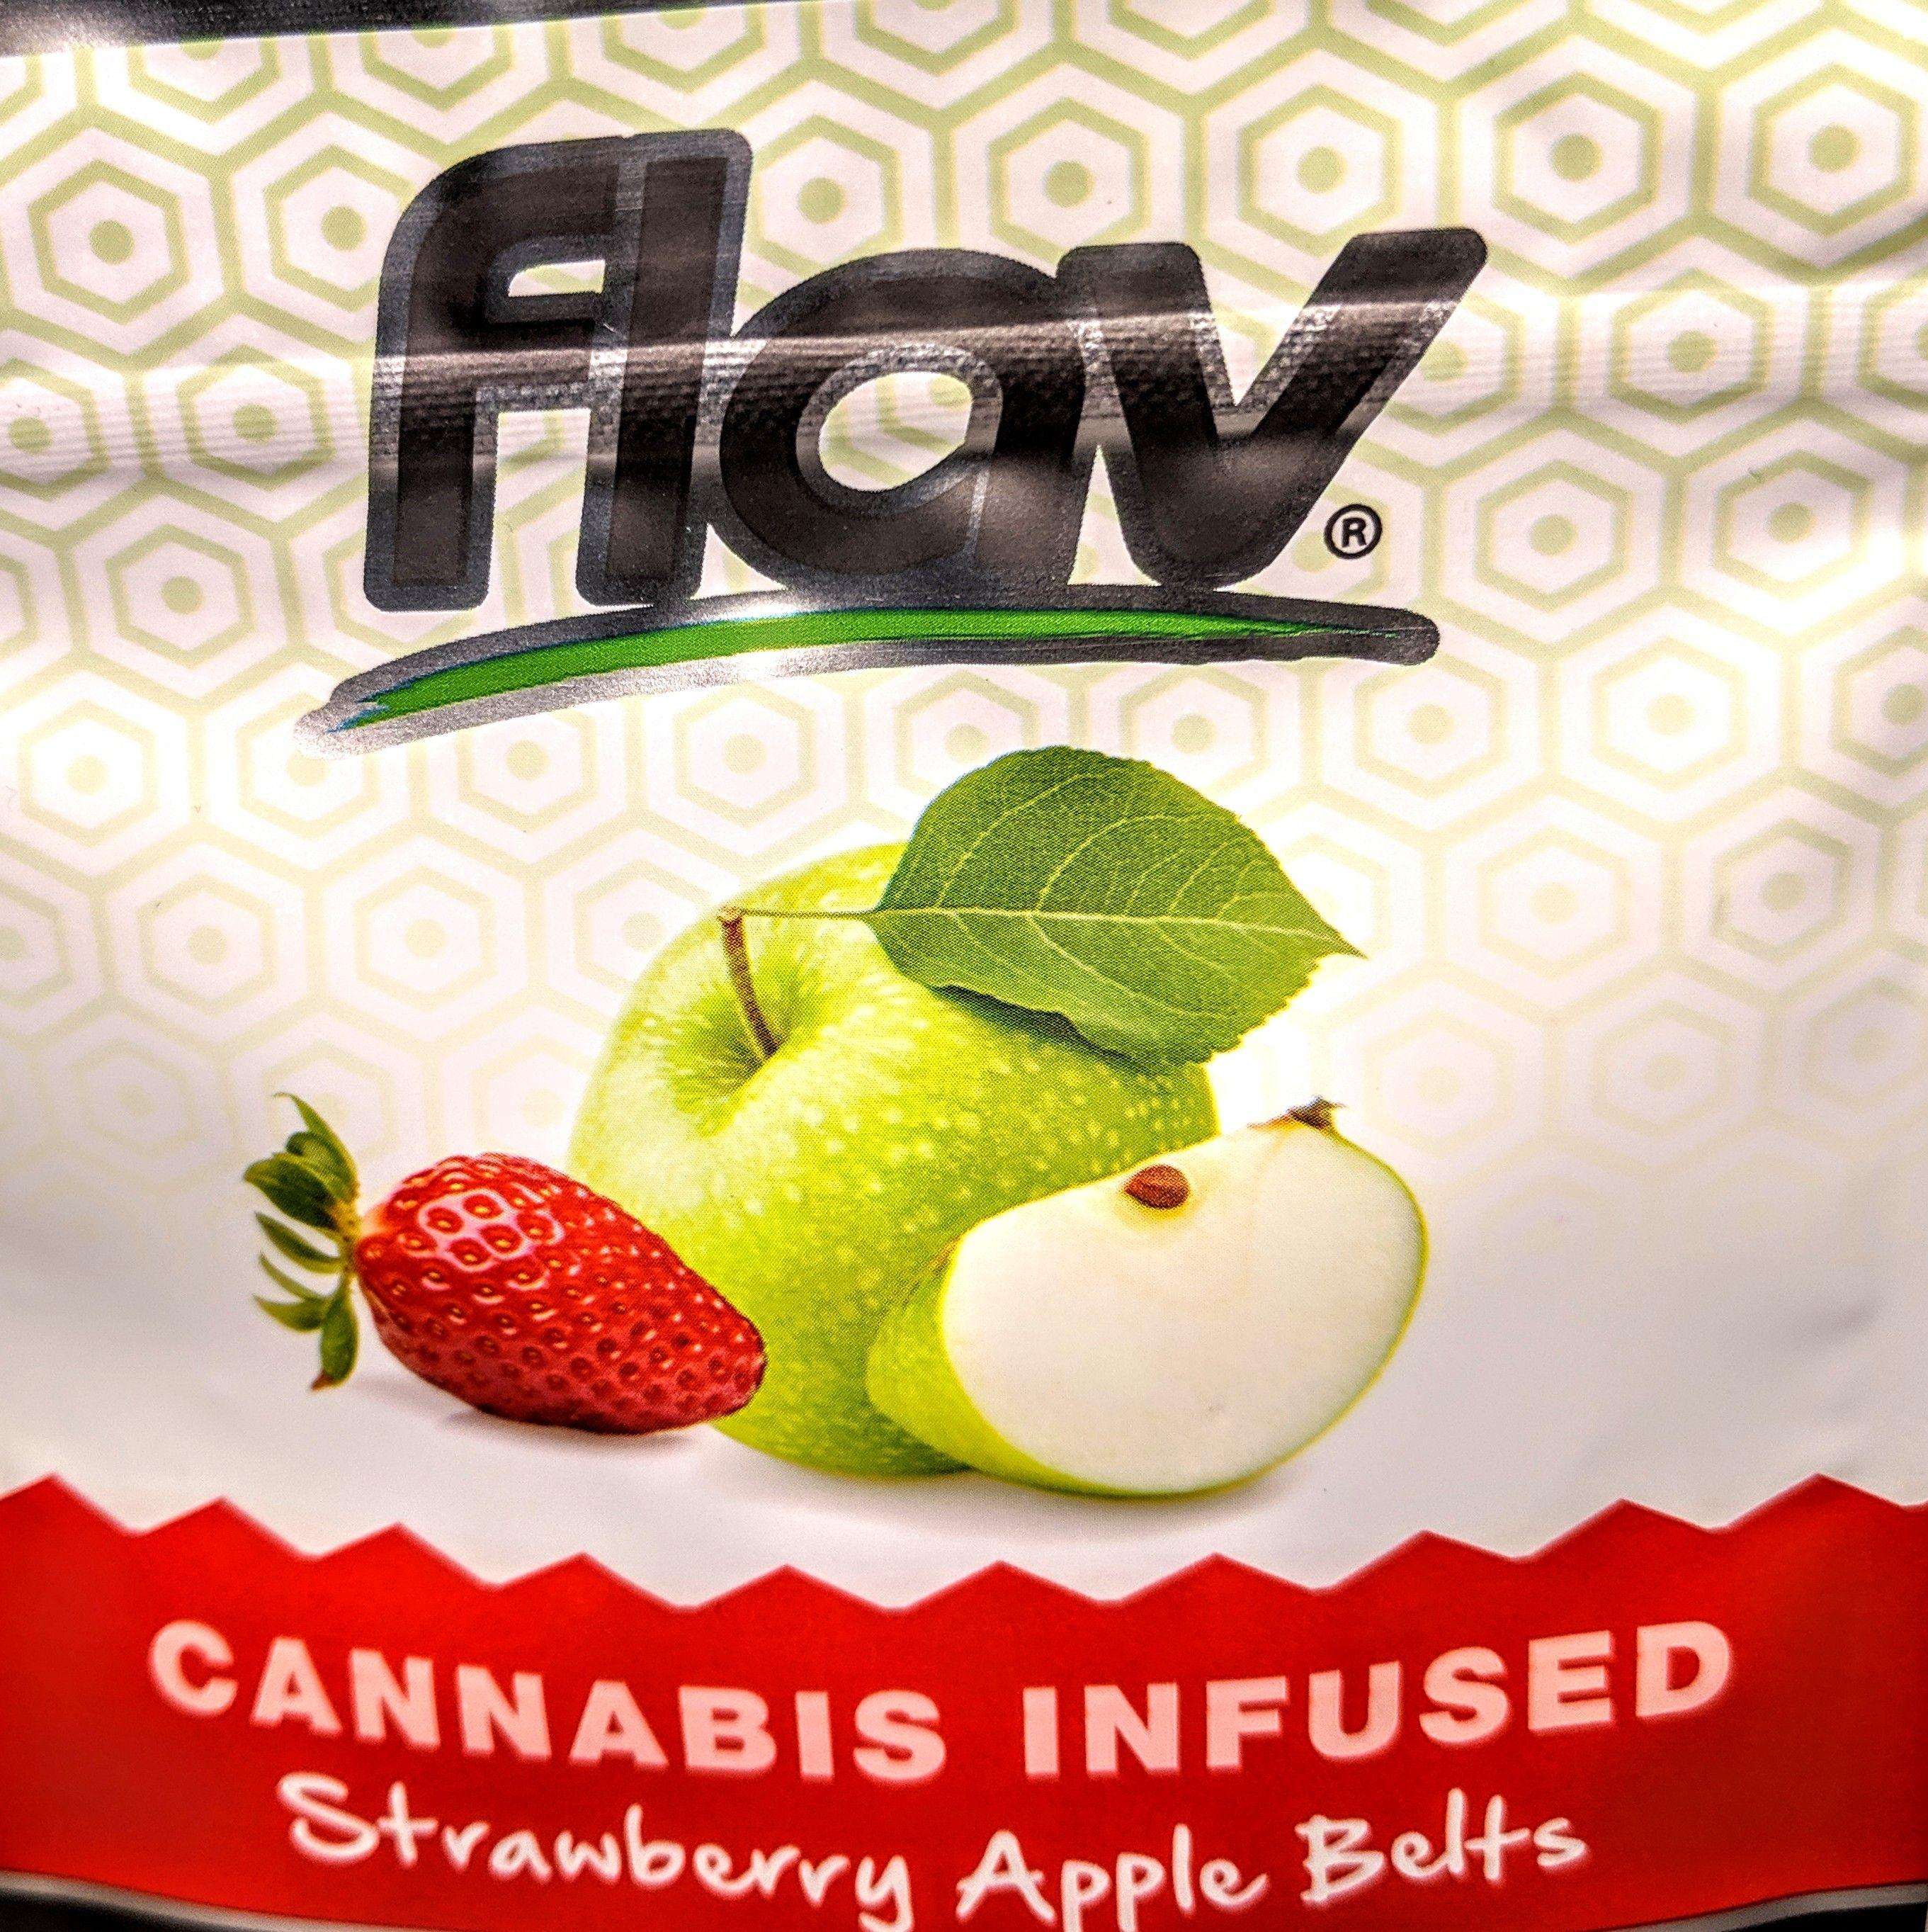 Flav - Strawberry Apple Gummy Belts